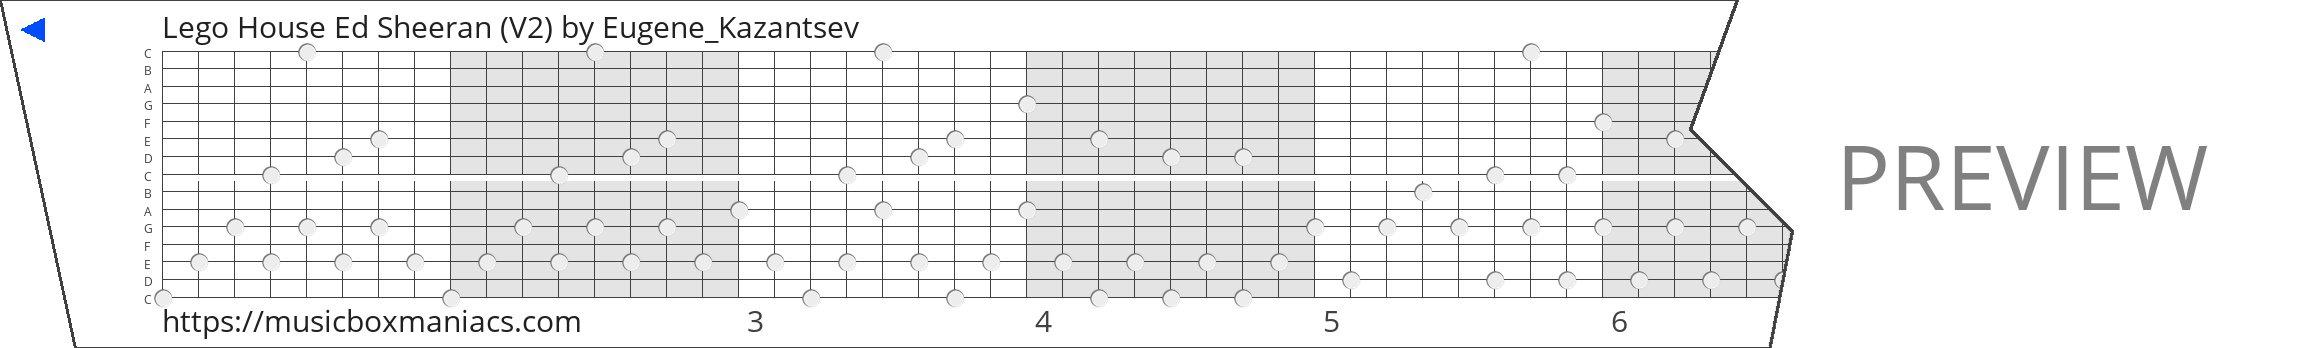 Lego House Ed Sheeran (V2) 15 note music box paper strip